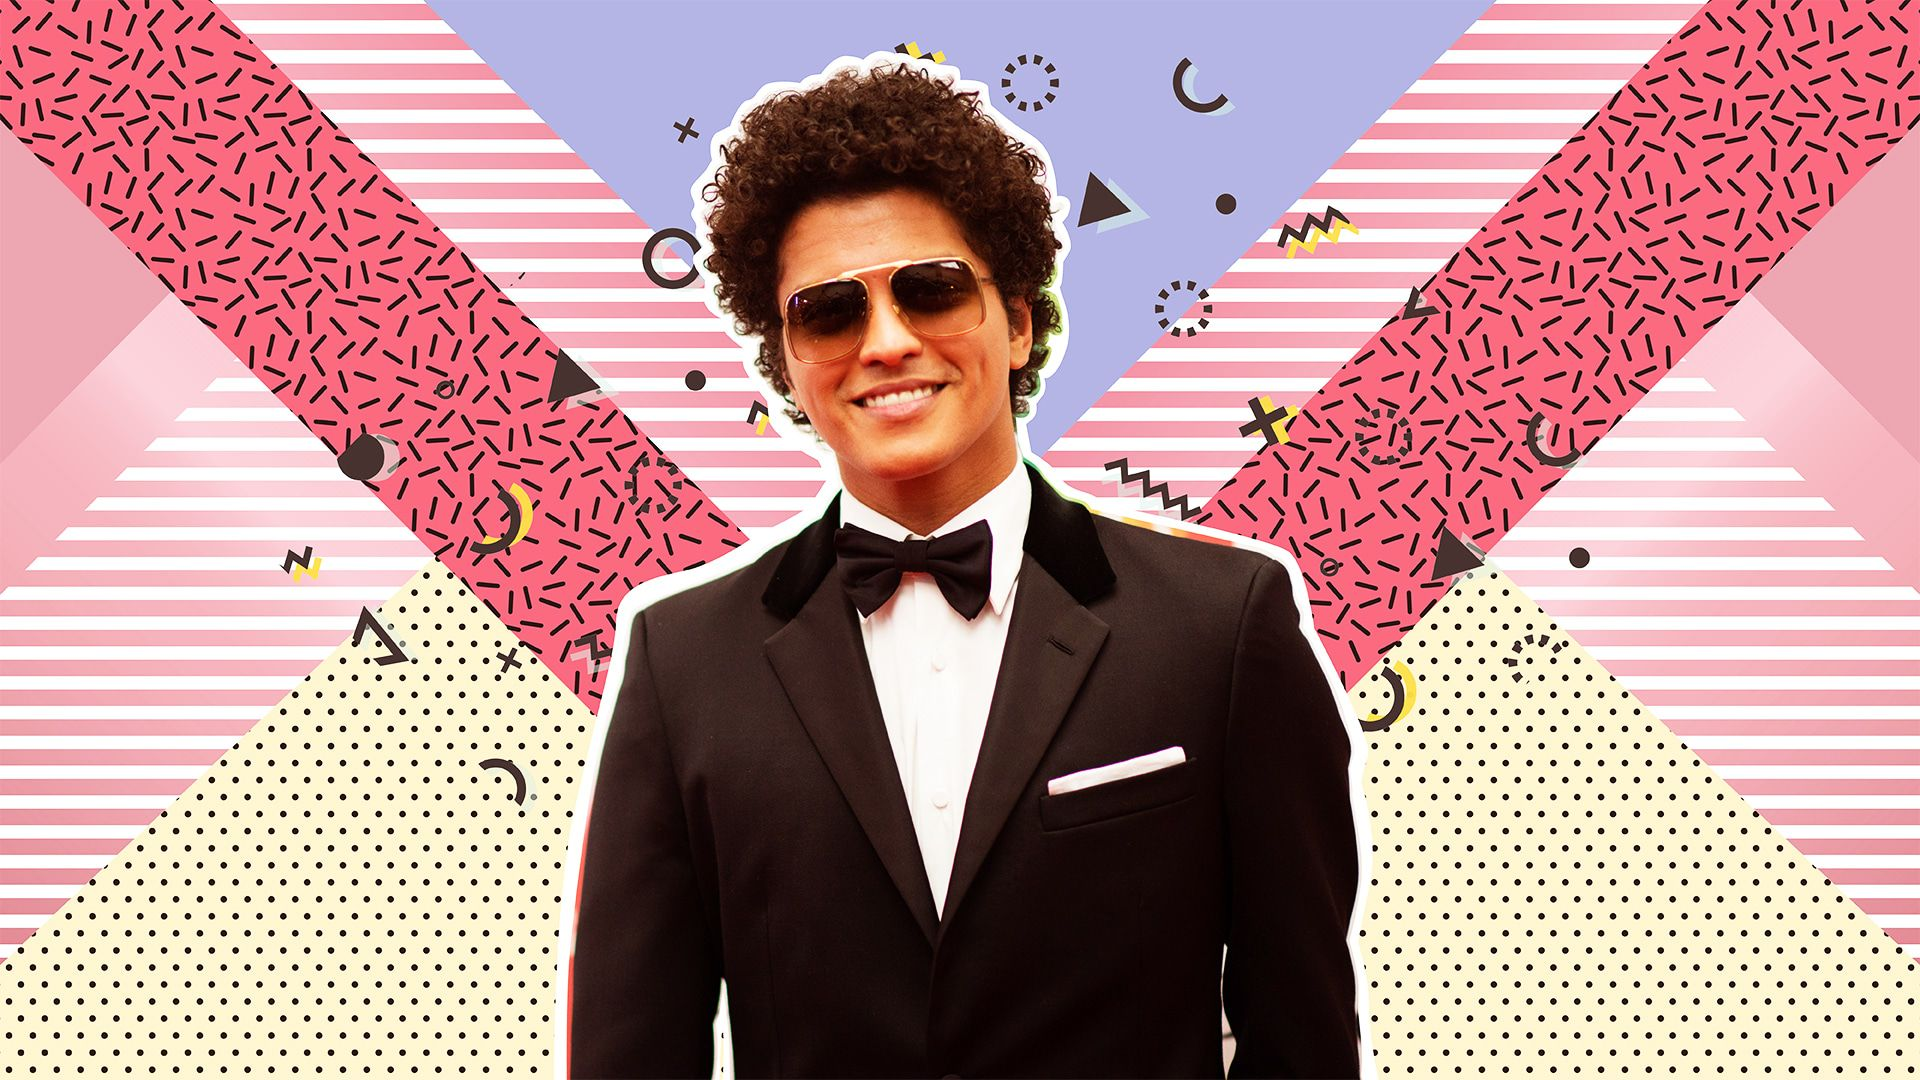 Bruno Mars Wallpaper Hd Iphone